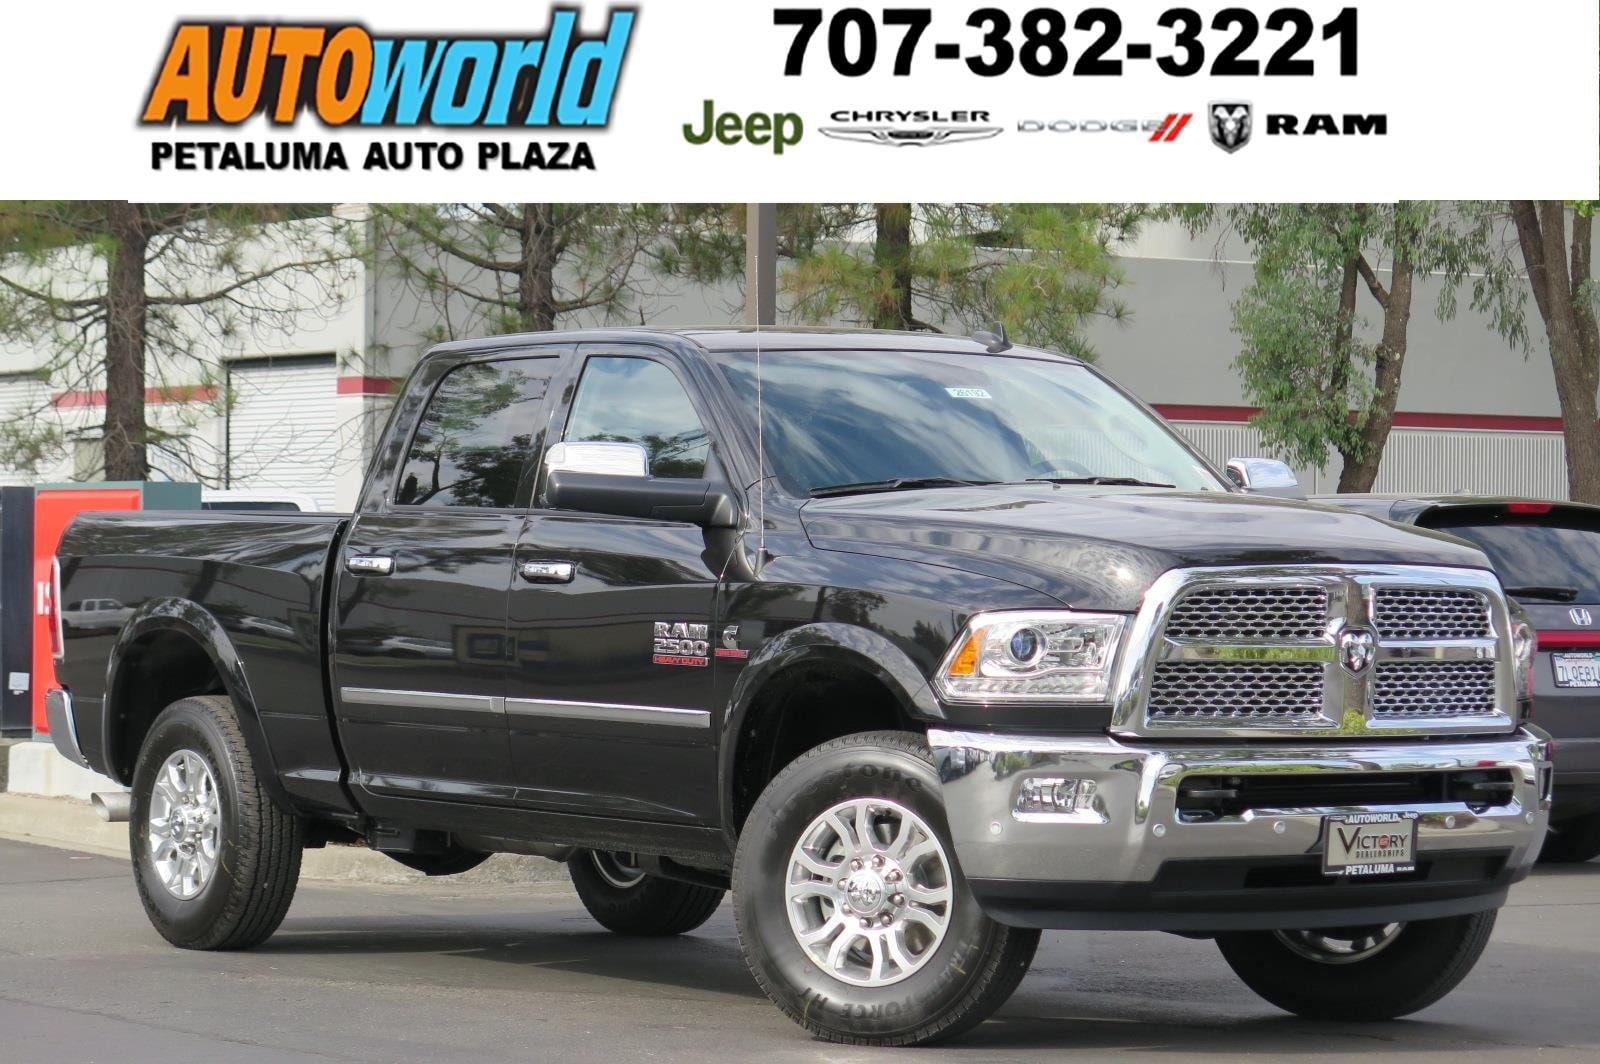 Autoworld Dodge Chrysler Jeep RAM | Vehicles for sale in Petaluma ...